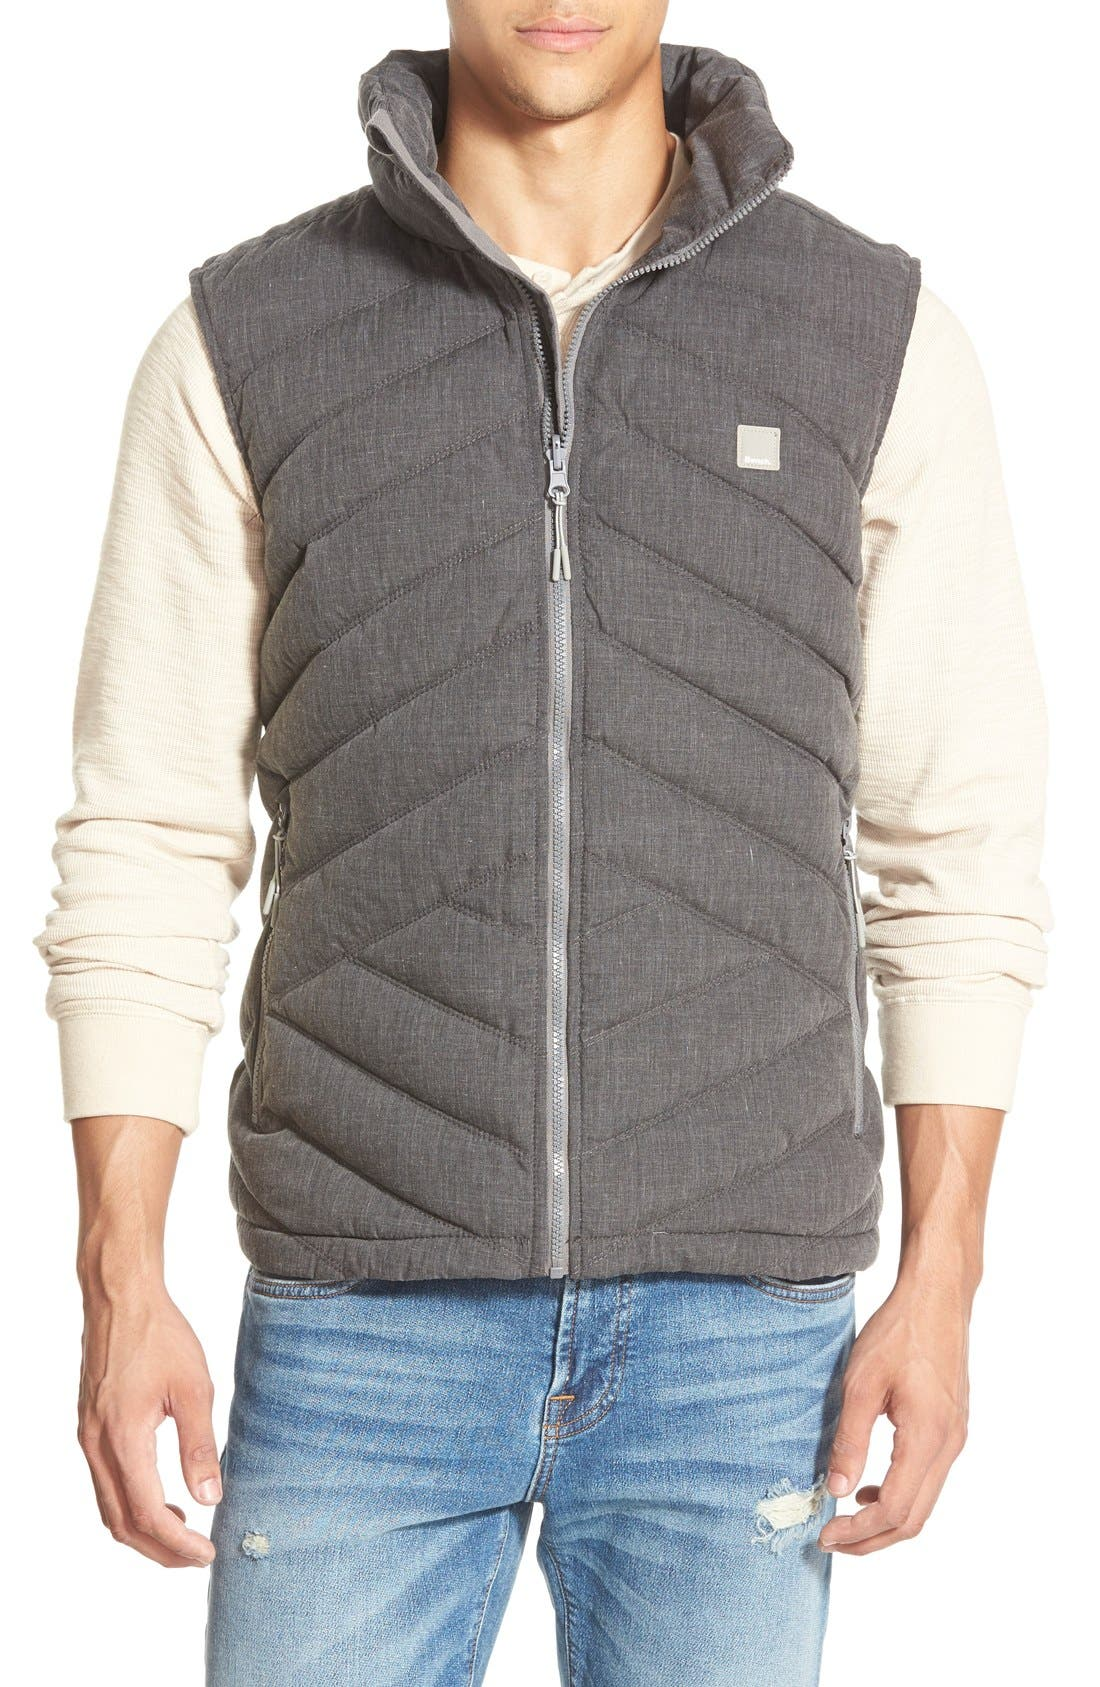 BENCH. Bench Regular Fit Quilted Vest, Main, color, 001